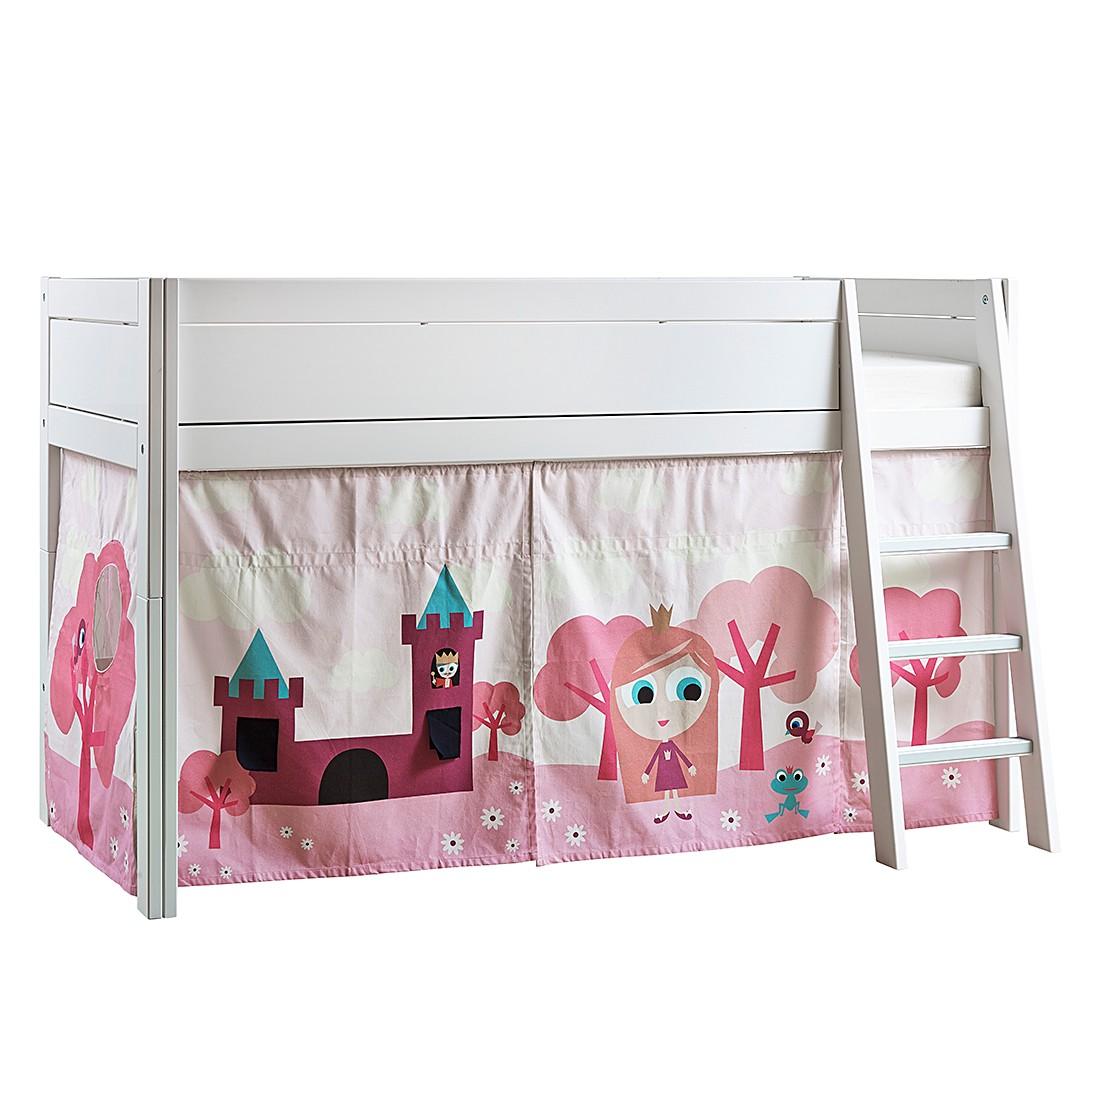 Halbhohes Bett Lifetime Original - Kiefer teilmassiv/Textil - Weiß/Rosa - Mit Deluxe Lattenrost, Lifetime Kidsrooms